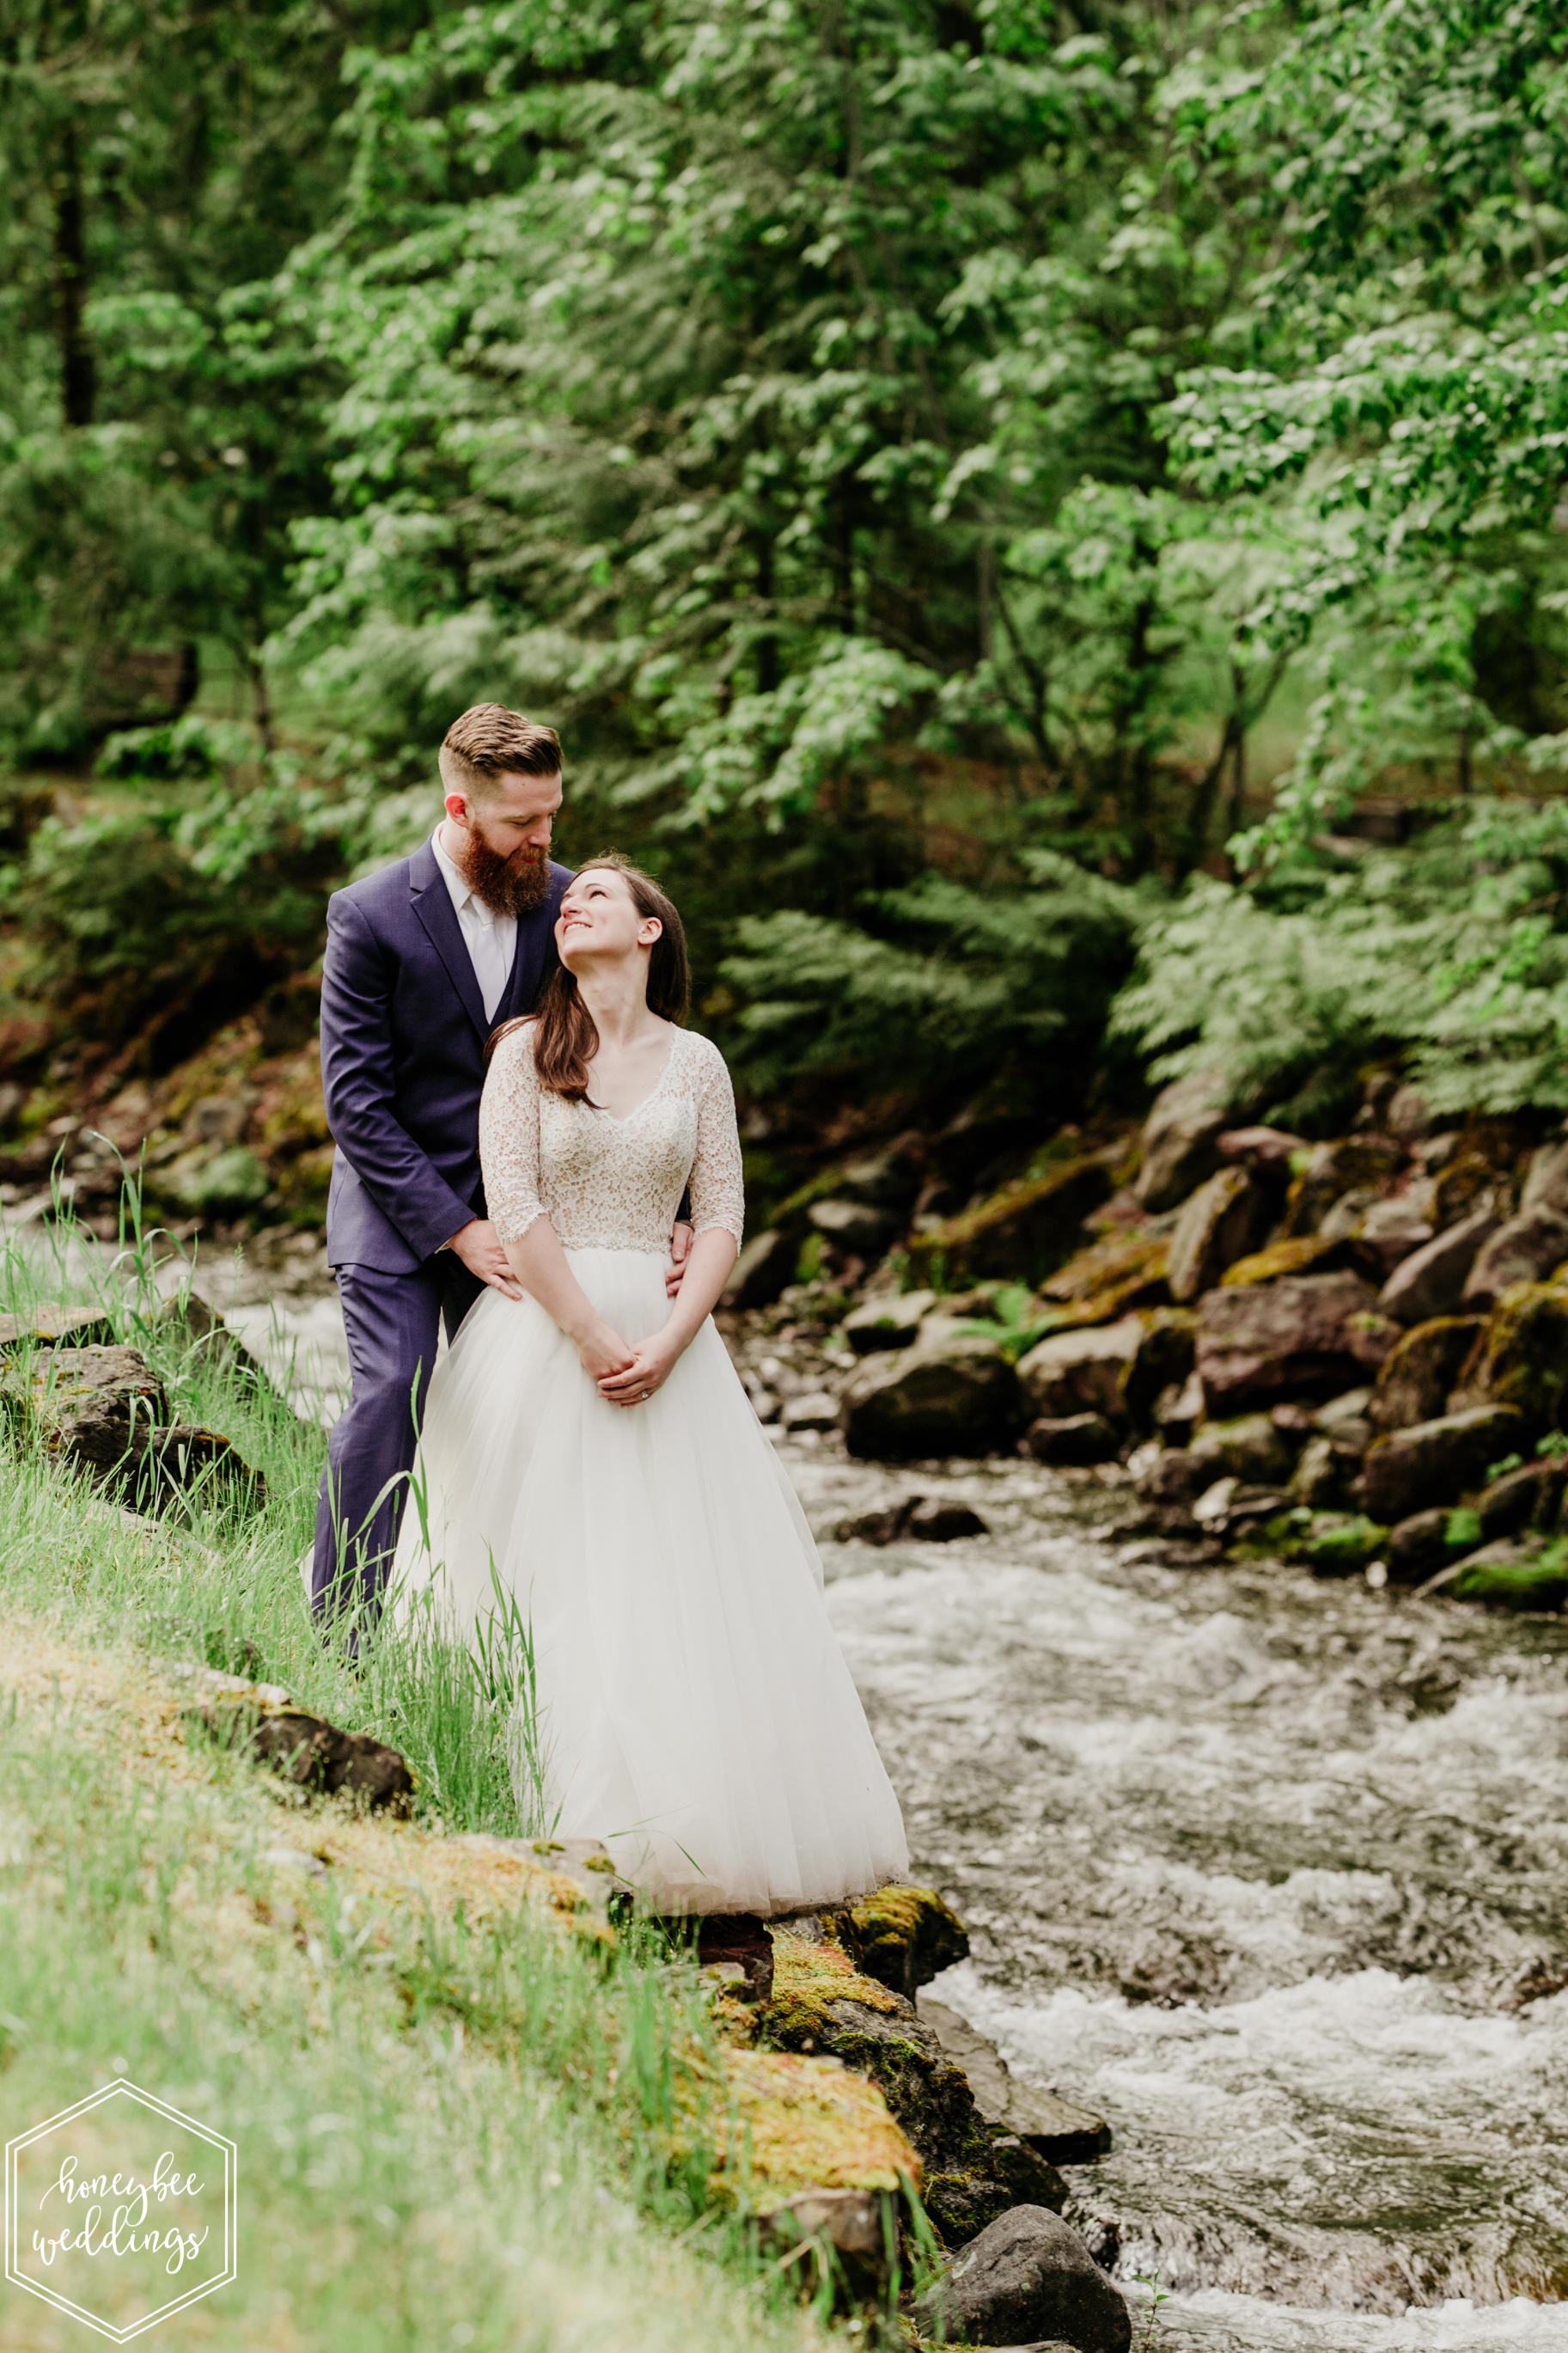 245Glacier National Park Wedding_Izaak Walton Inn Wedding_Honeybee Weddings_Norah & Kyle_June 09, 2019-49.jpg